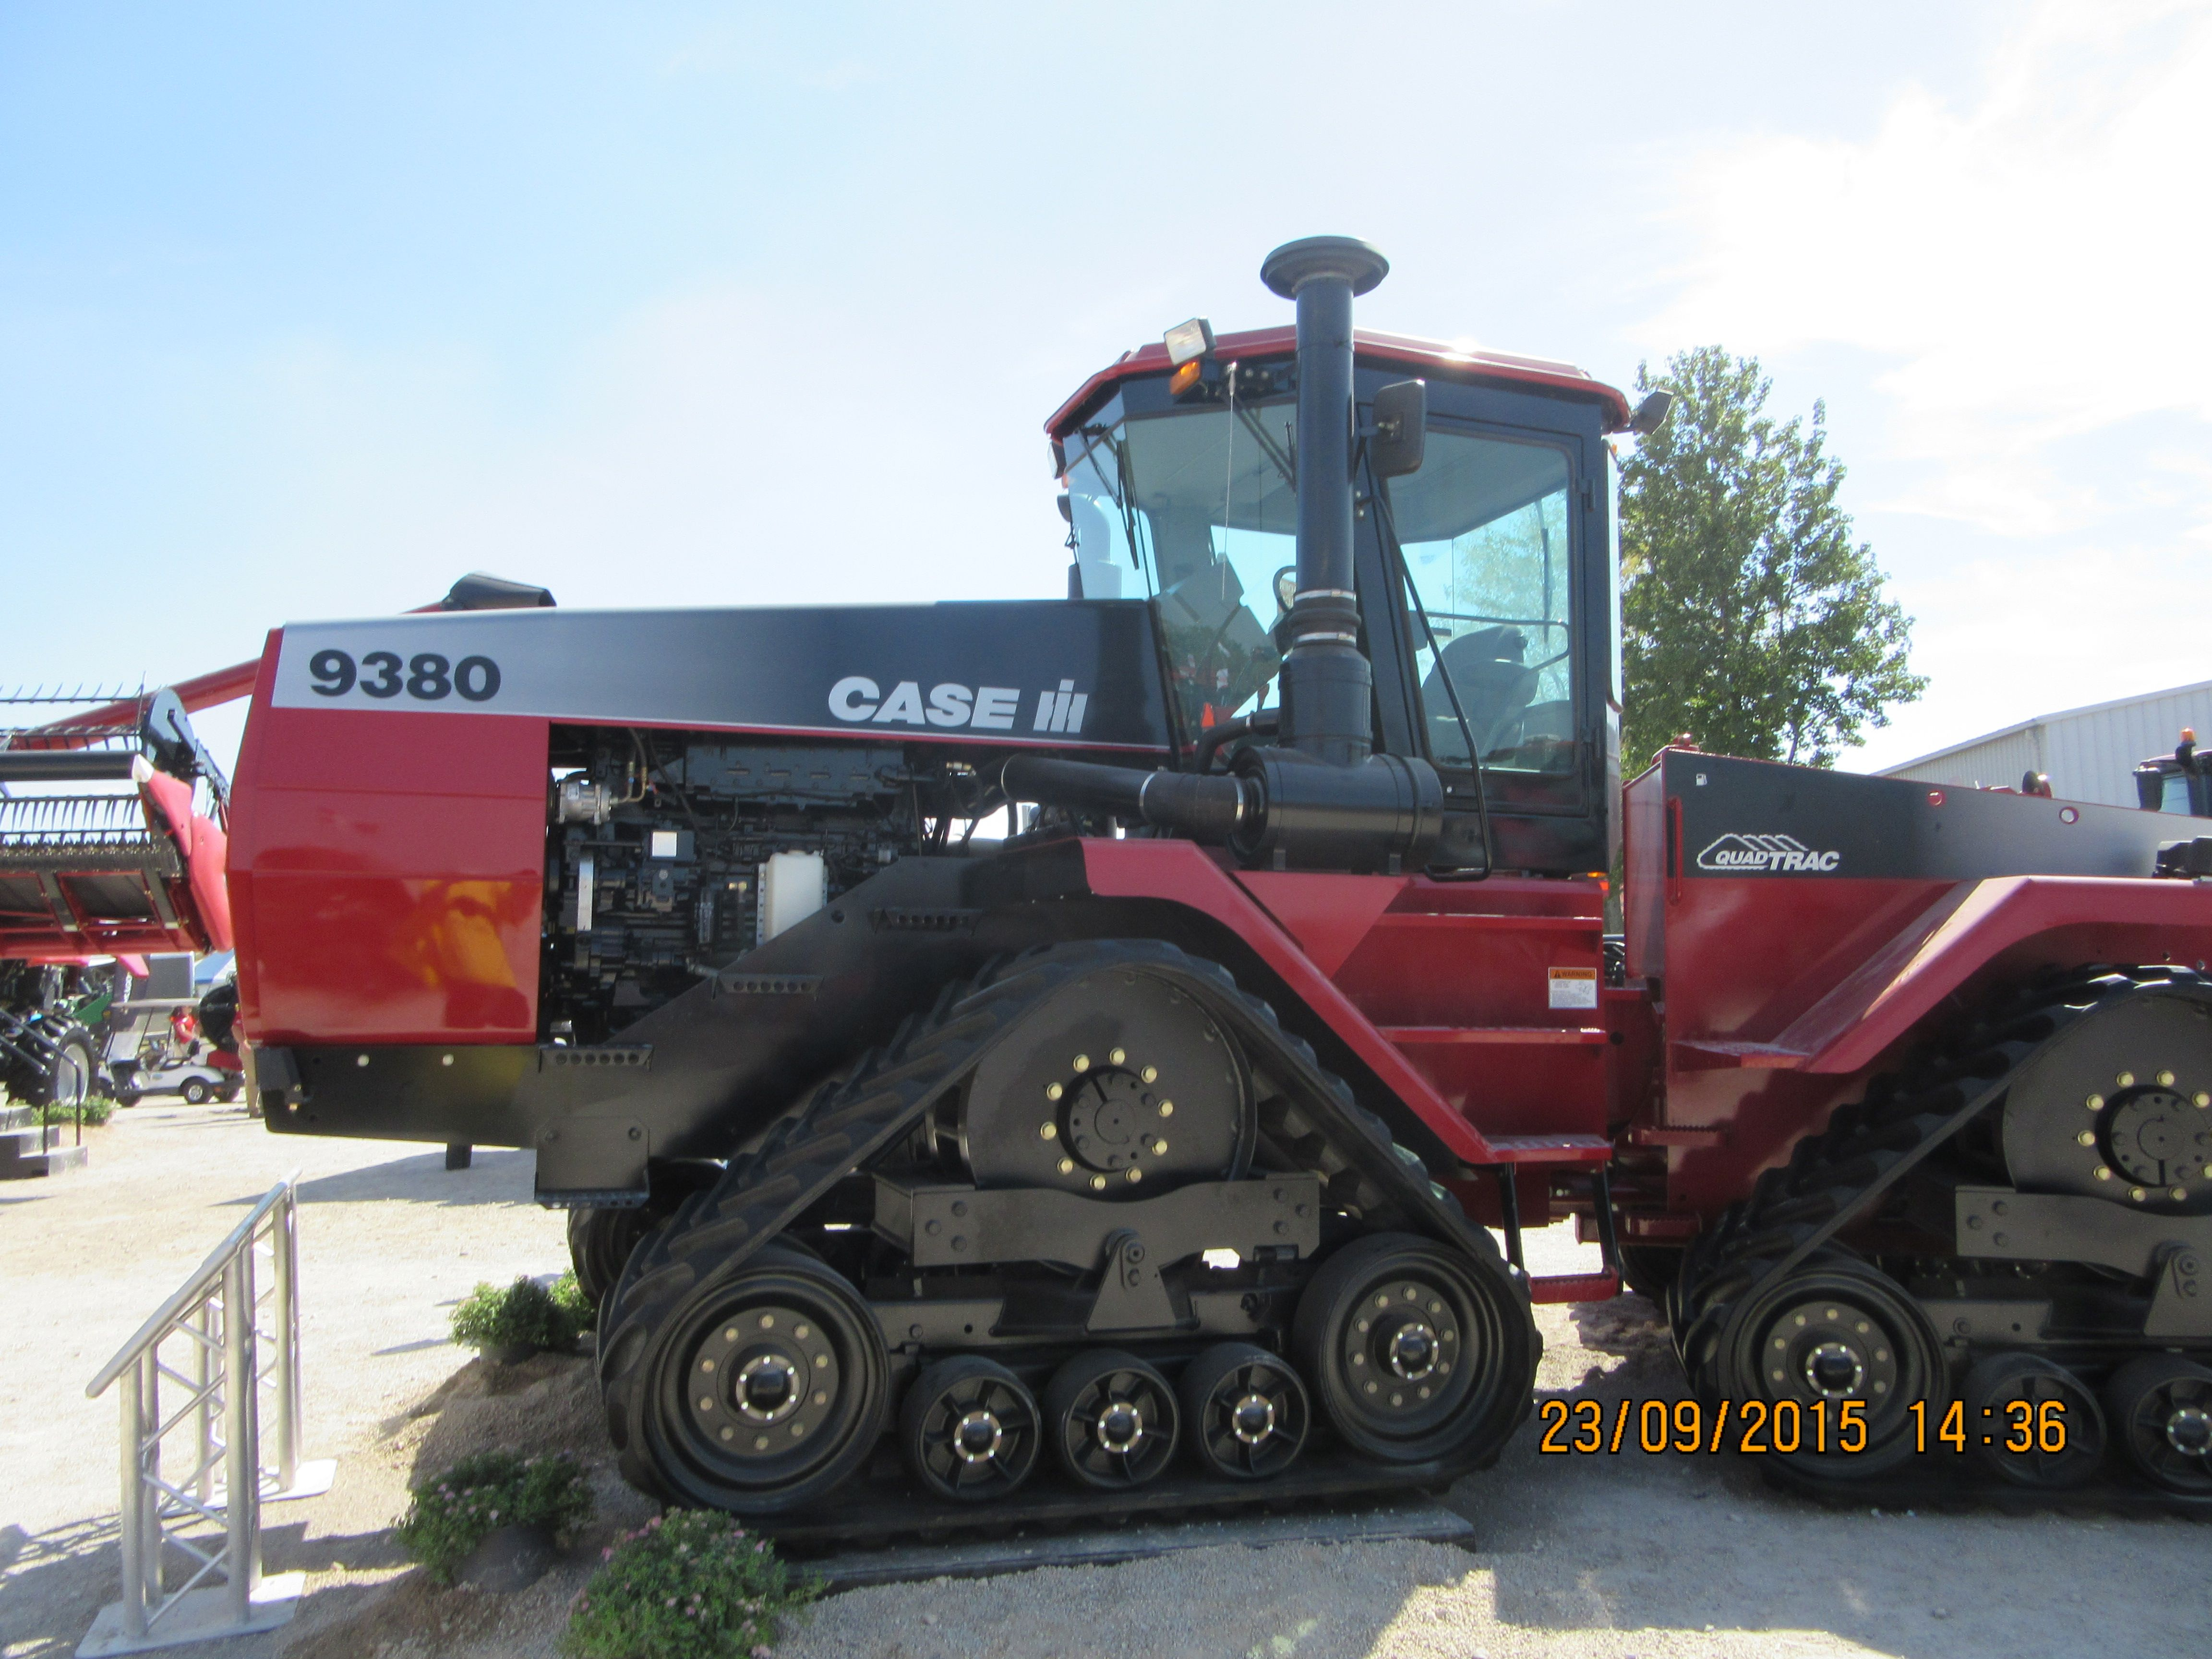 medium resolution of caseih steiger 9380 quadtrac case ih tractors big tractors international harvester down on